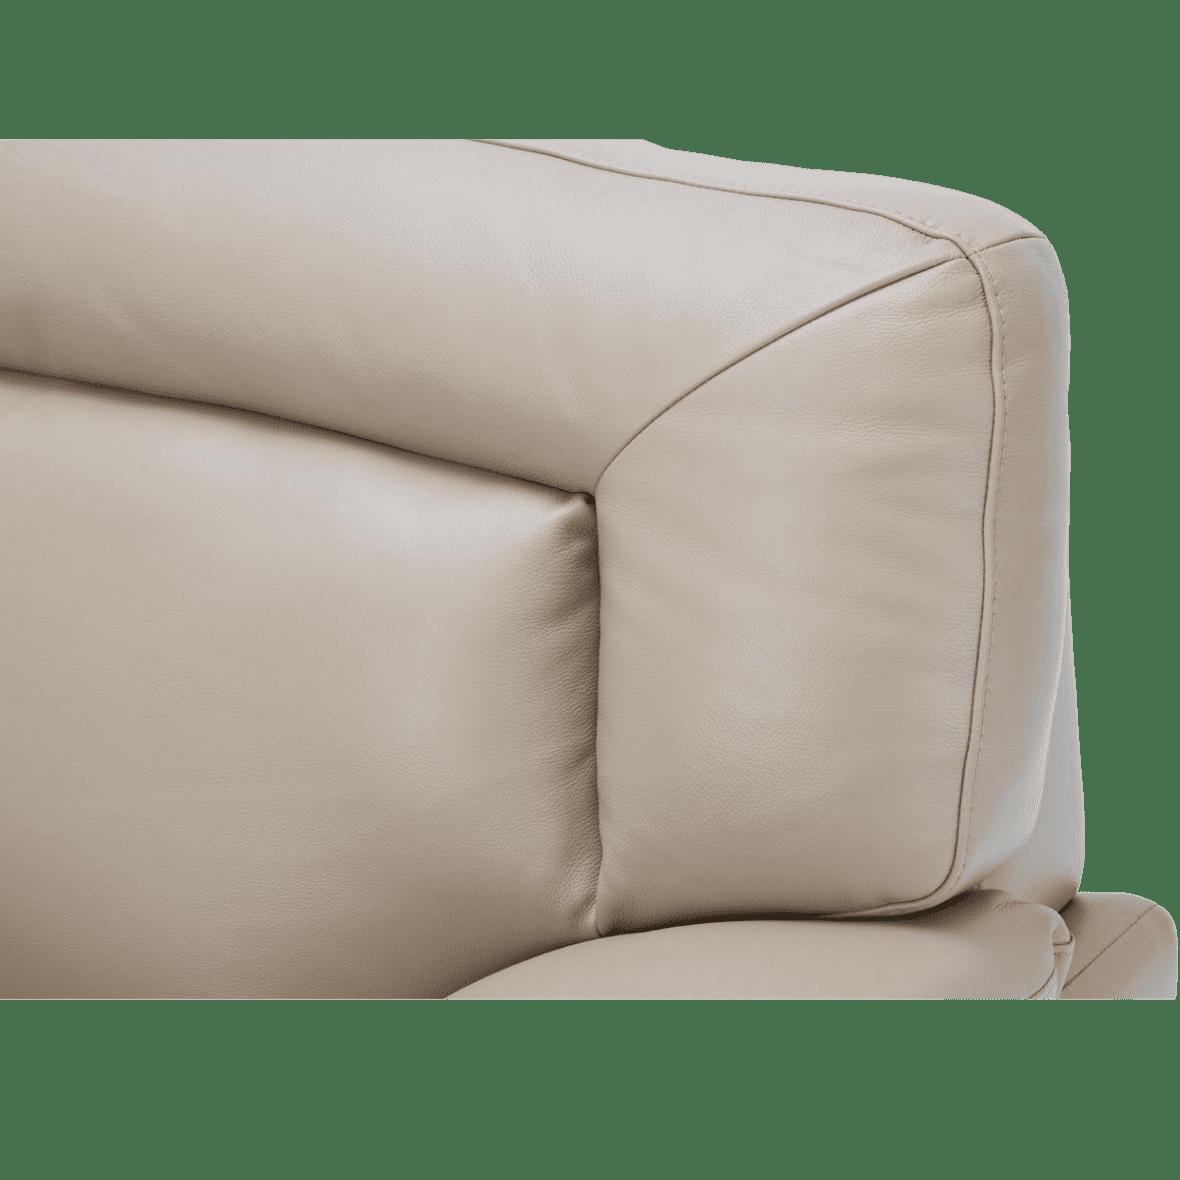 Turano кожаная матовая софа стандарт, Mocha